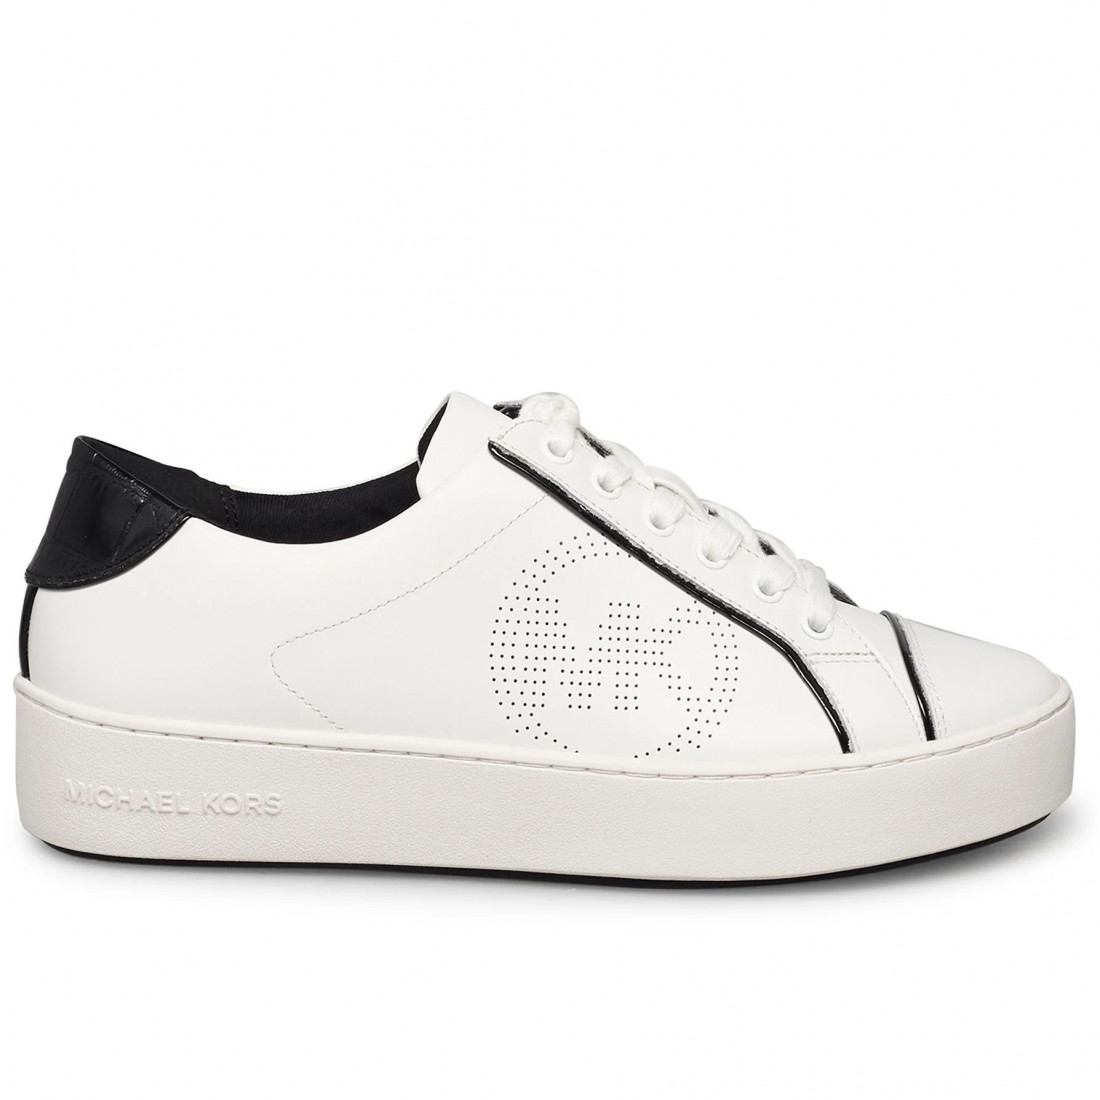 sneakers donna michael kors 43t0kbfs6l001 7522